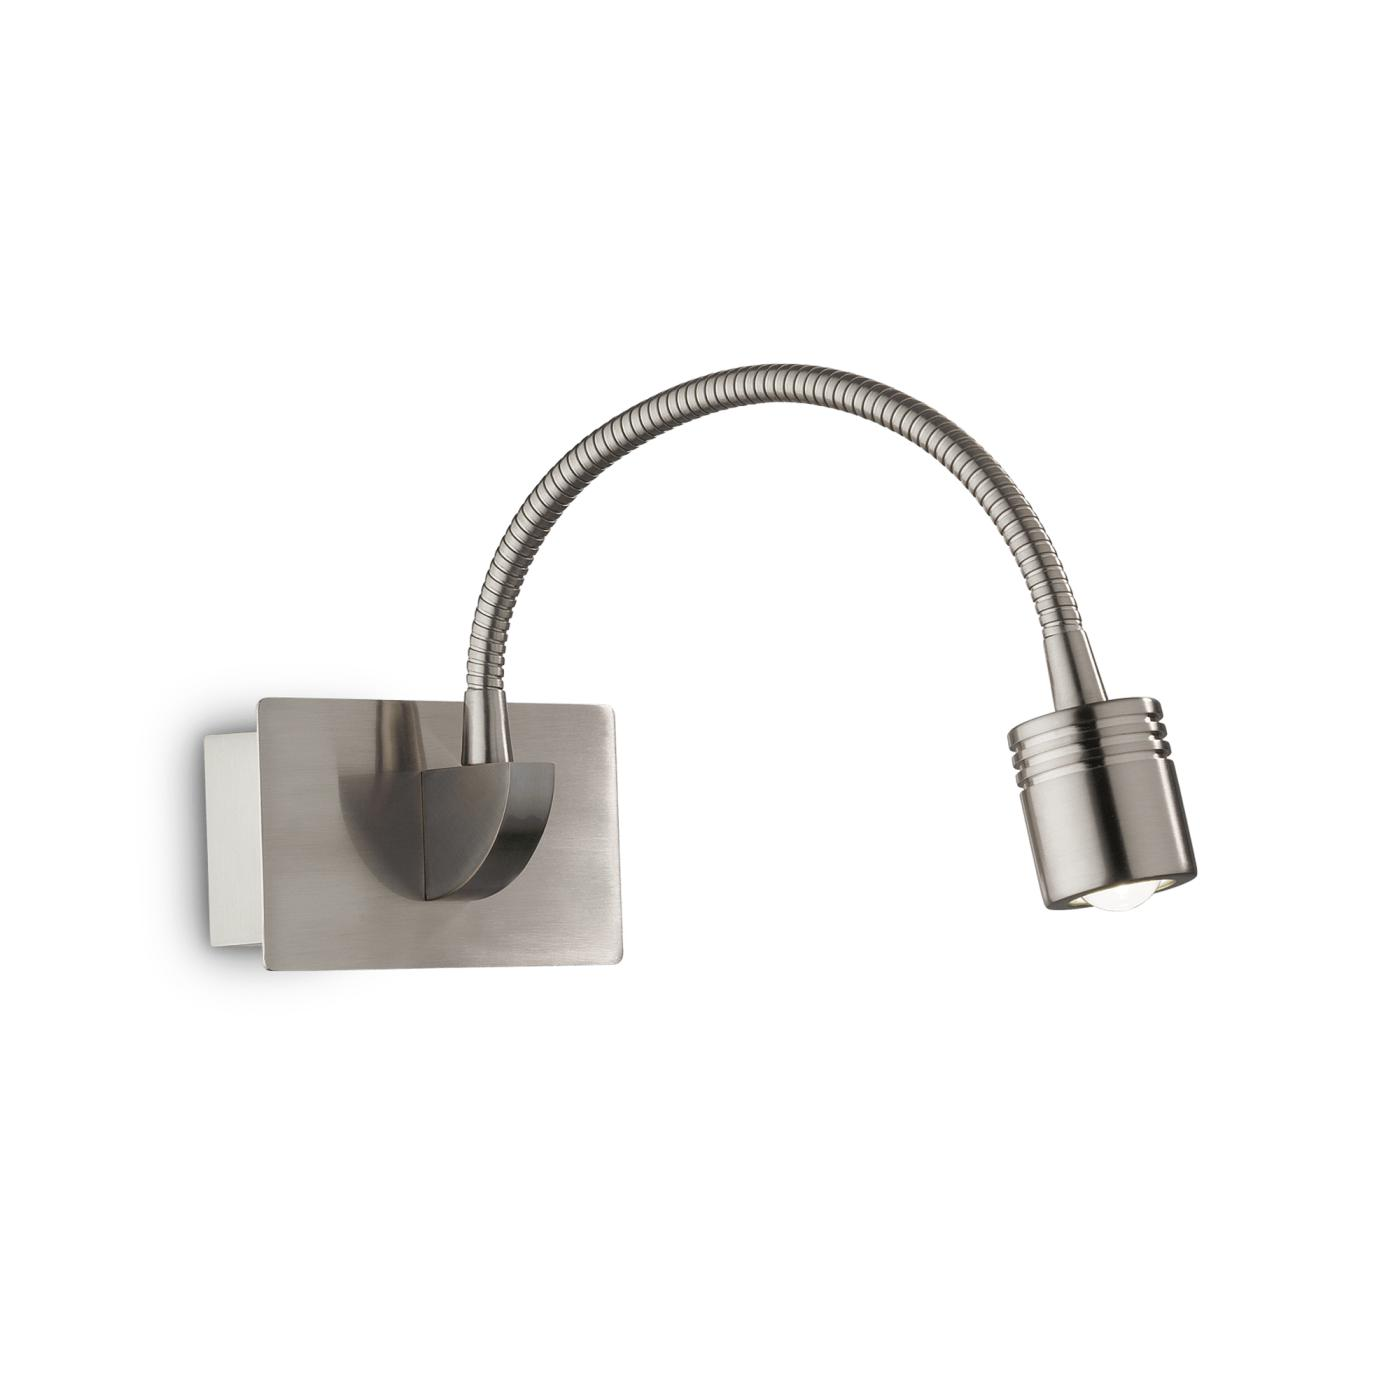 Nástěnná lampička Ideal LUX Dynamo Nickel